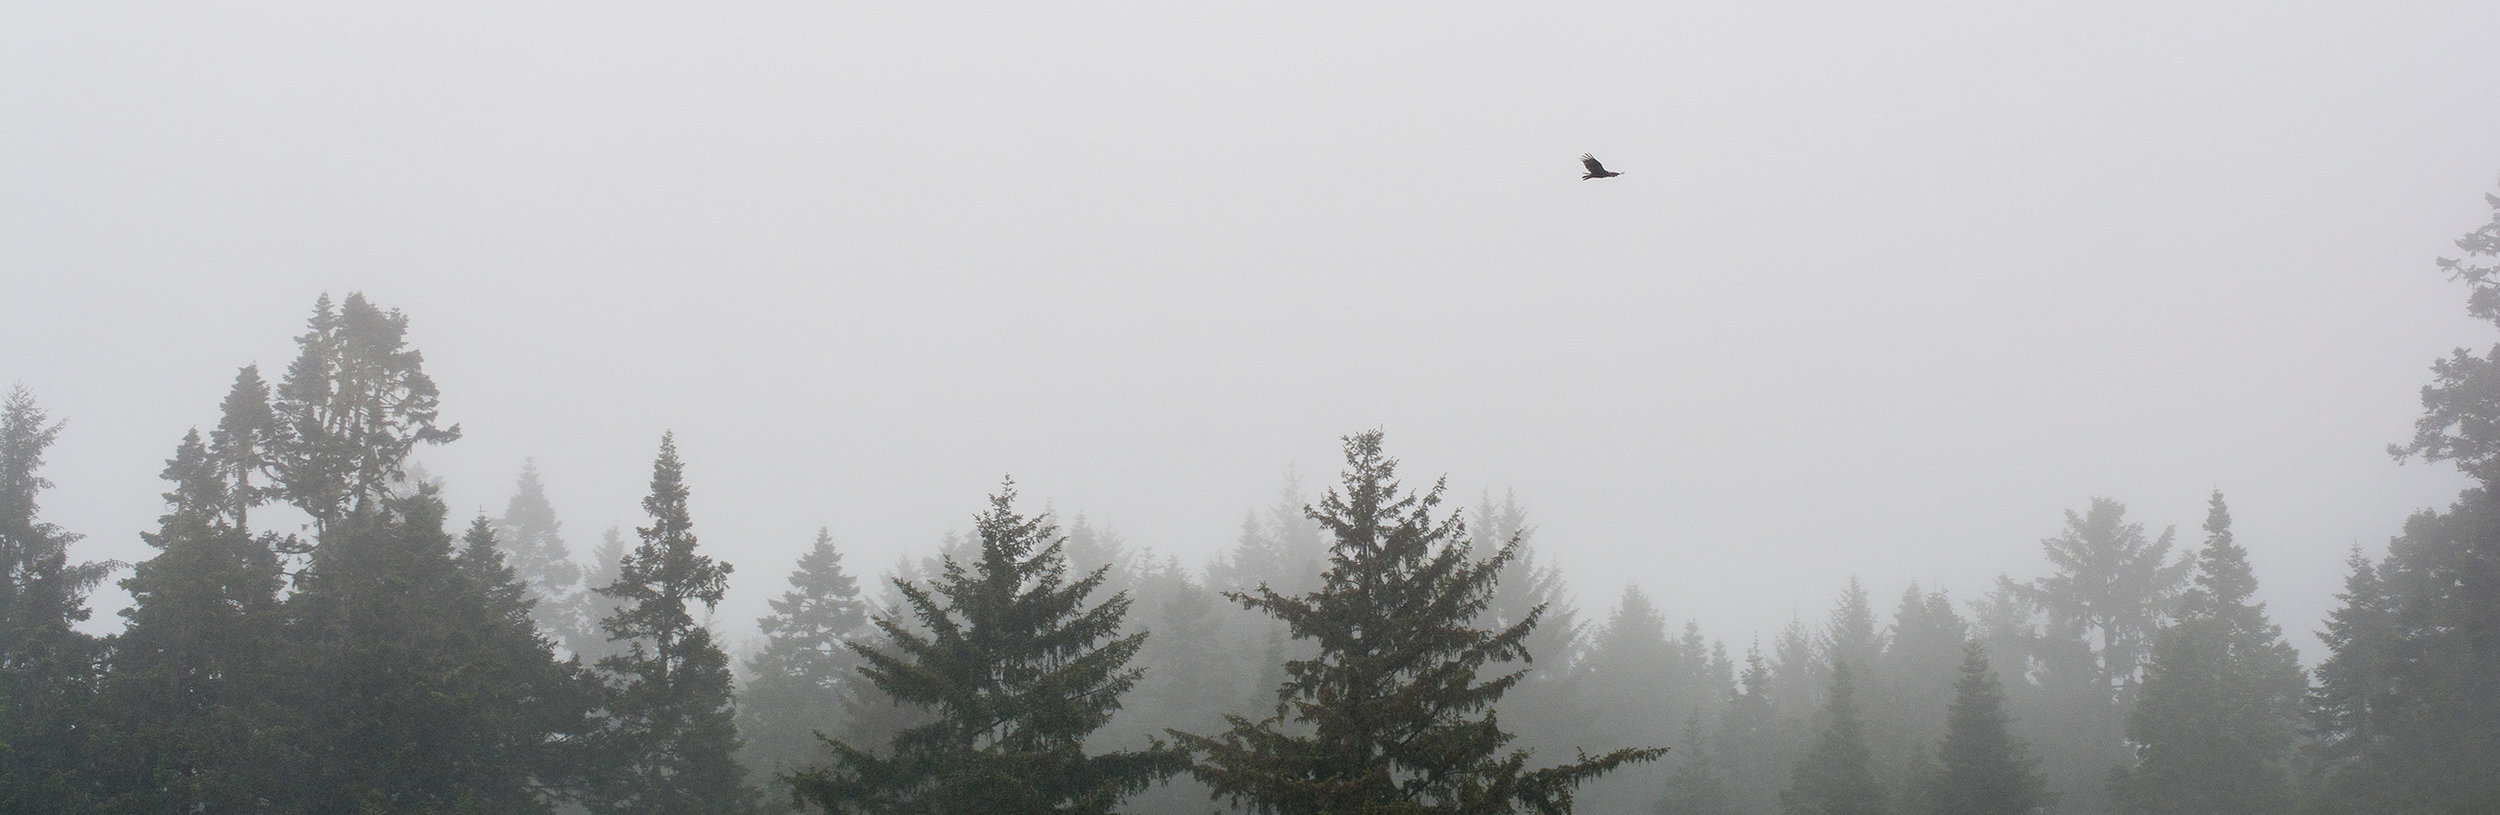 Vautour aura / Turkey vulture  (Cathartes aura)